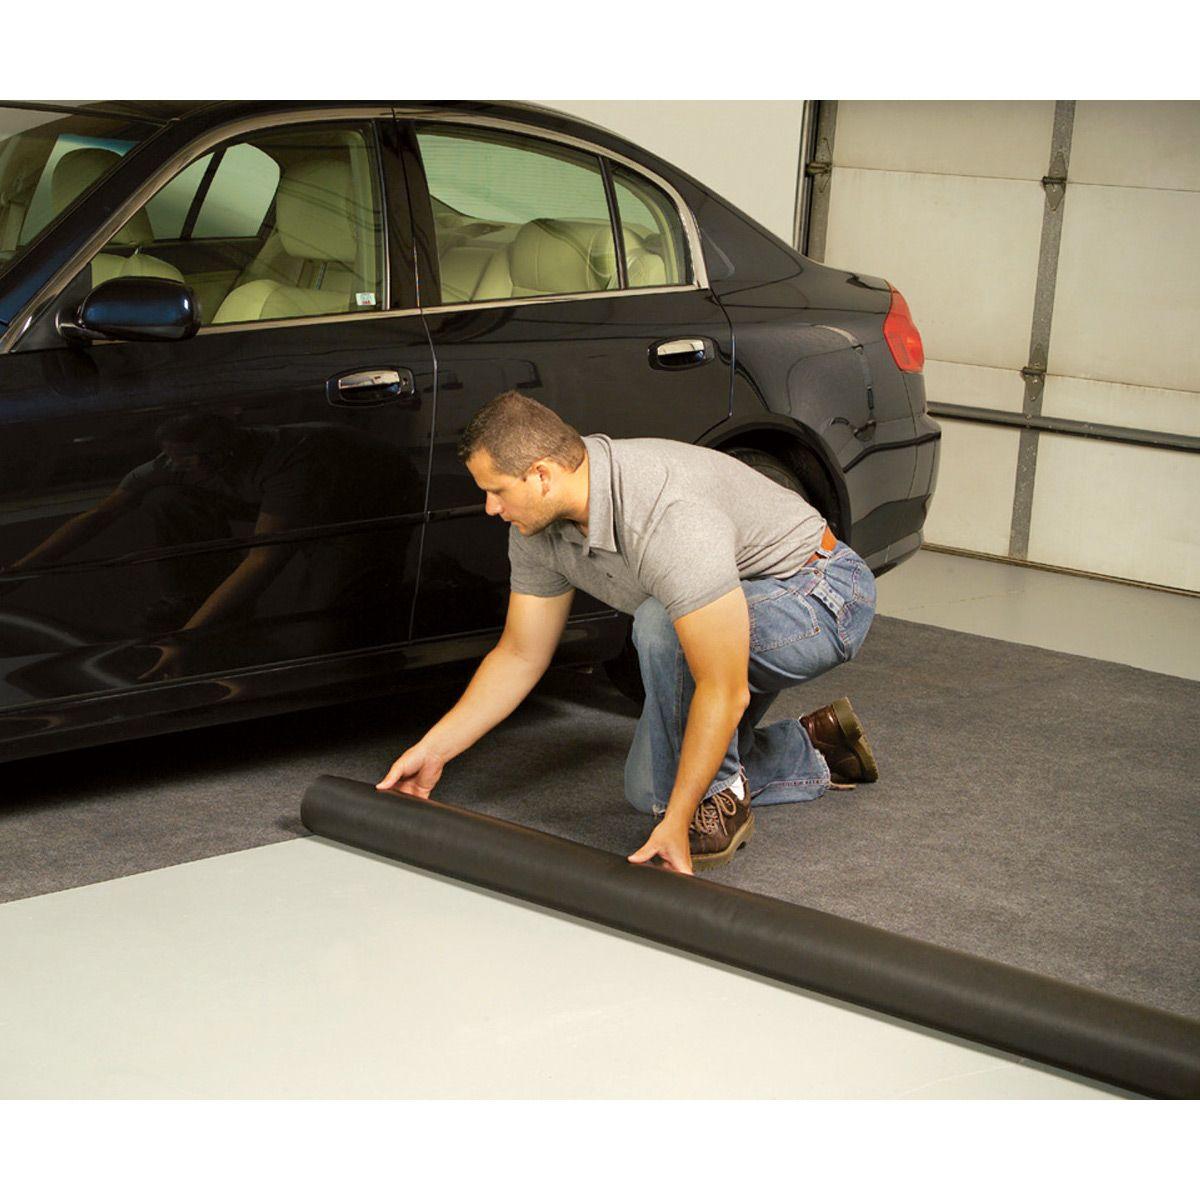 Rubber floor mats for garage gym - Flooring Drymate Garage Floor Mat Home Gym Flooring